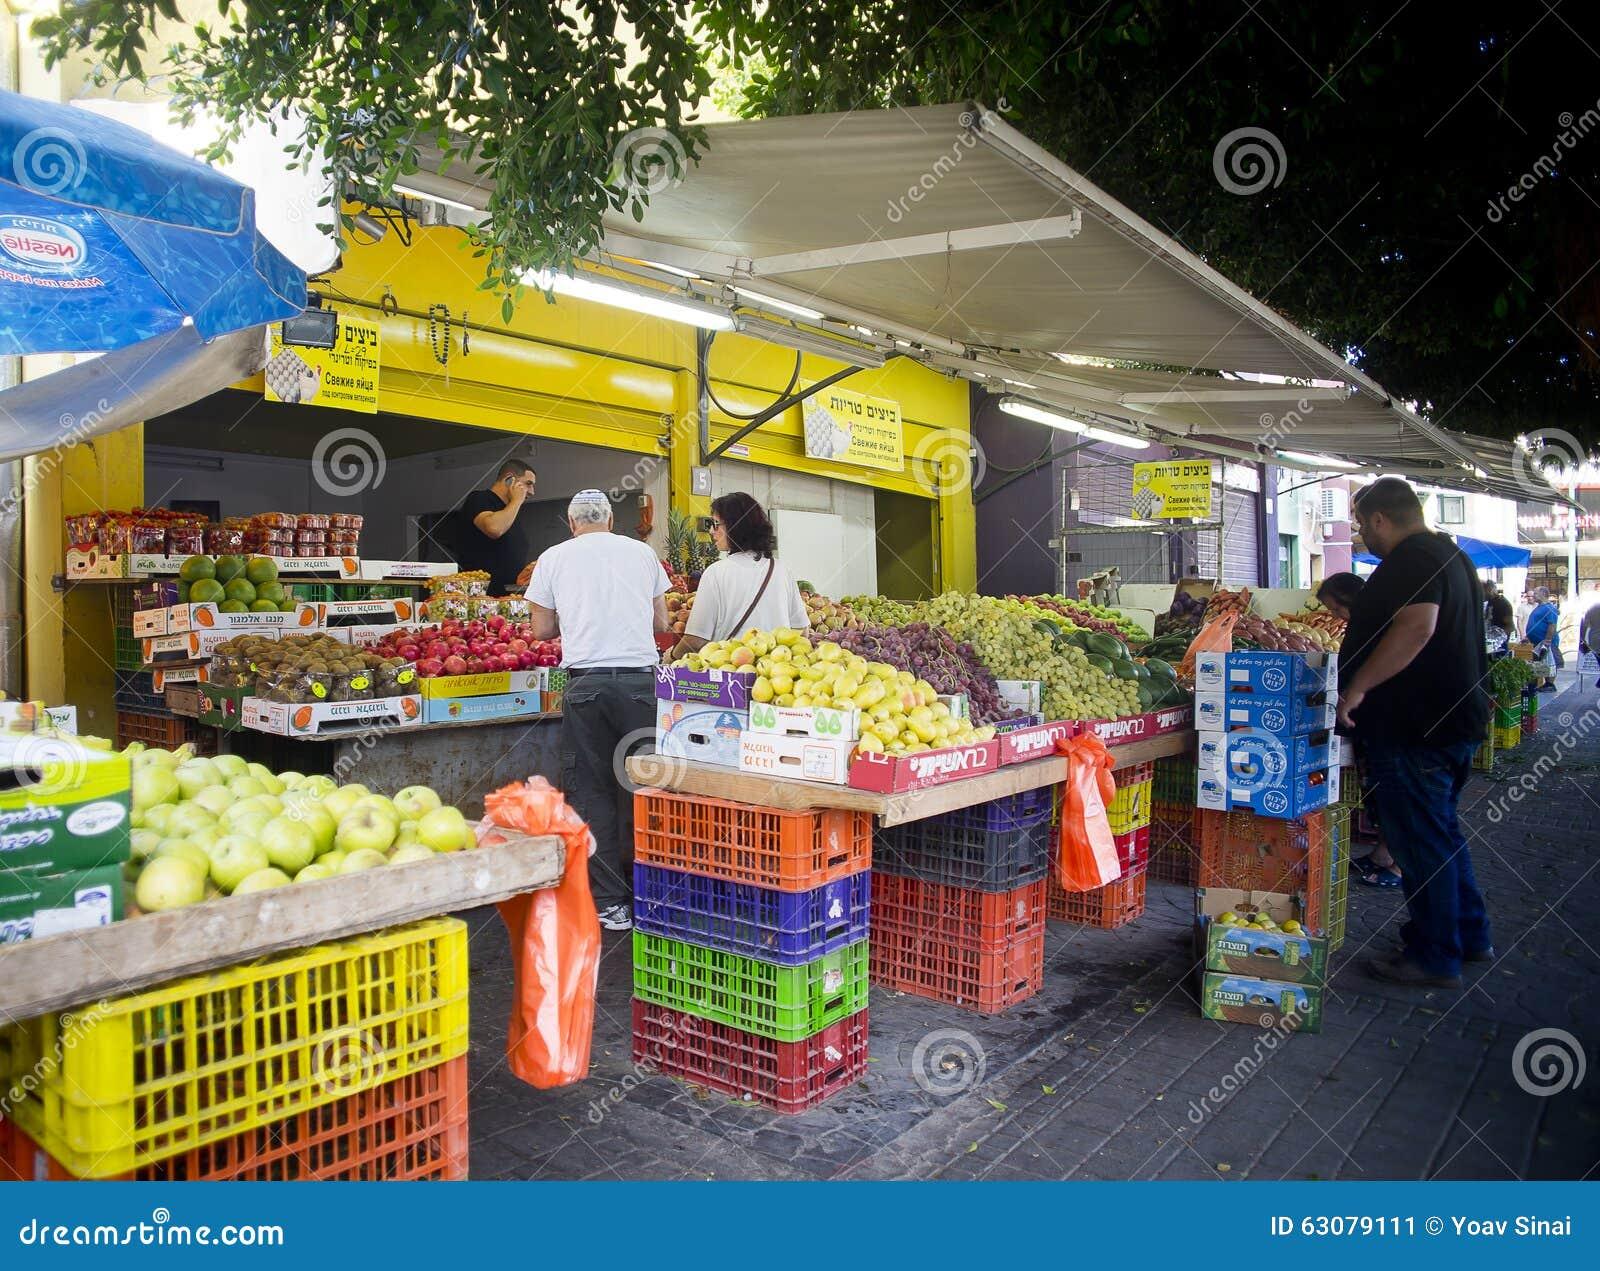 Download Marché De Fruits Et Légumes Hadera Israël Photo éditorial - Image du d0, plombs: 63079111